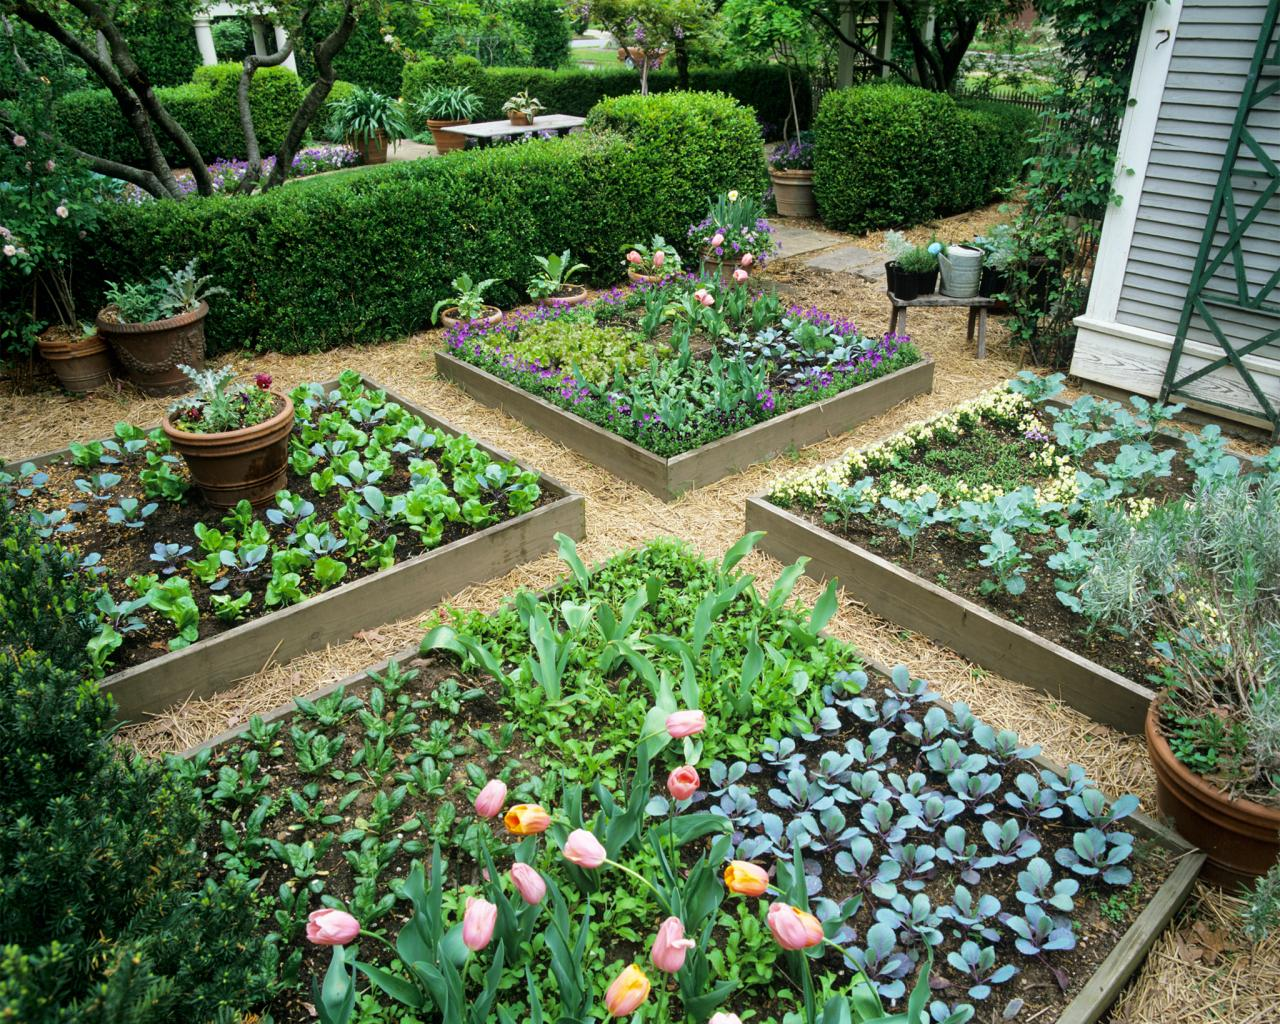 Bring Happy Faces To Your Garden Spaces